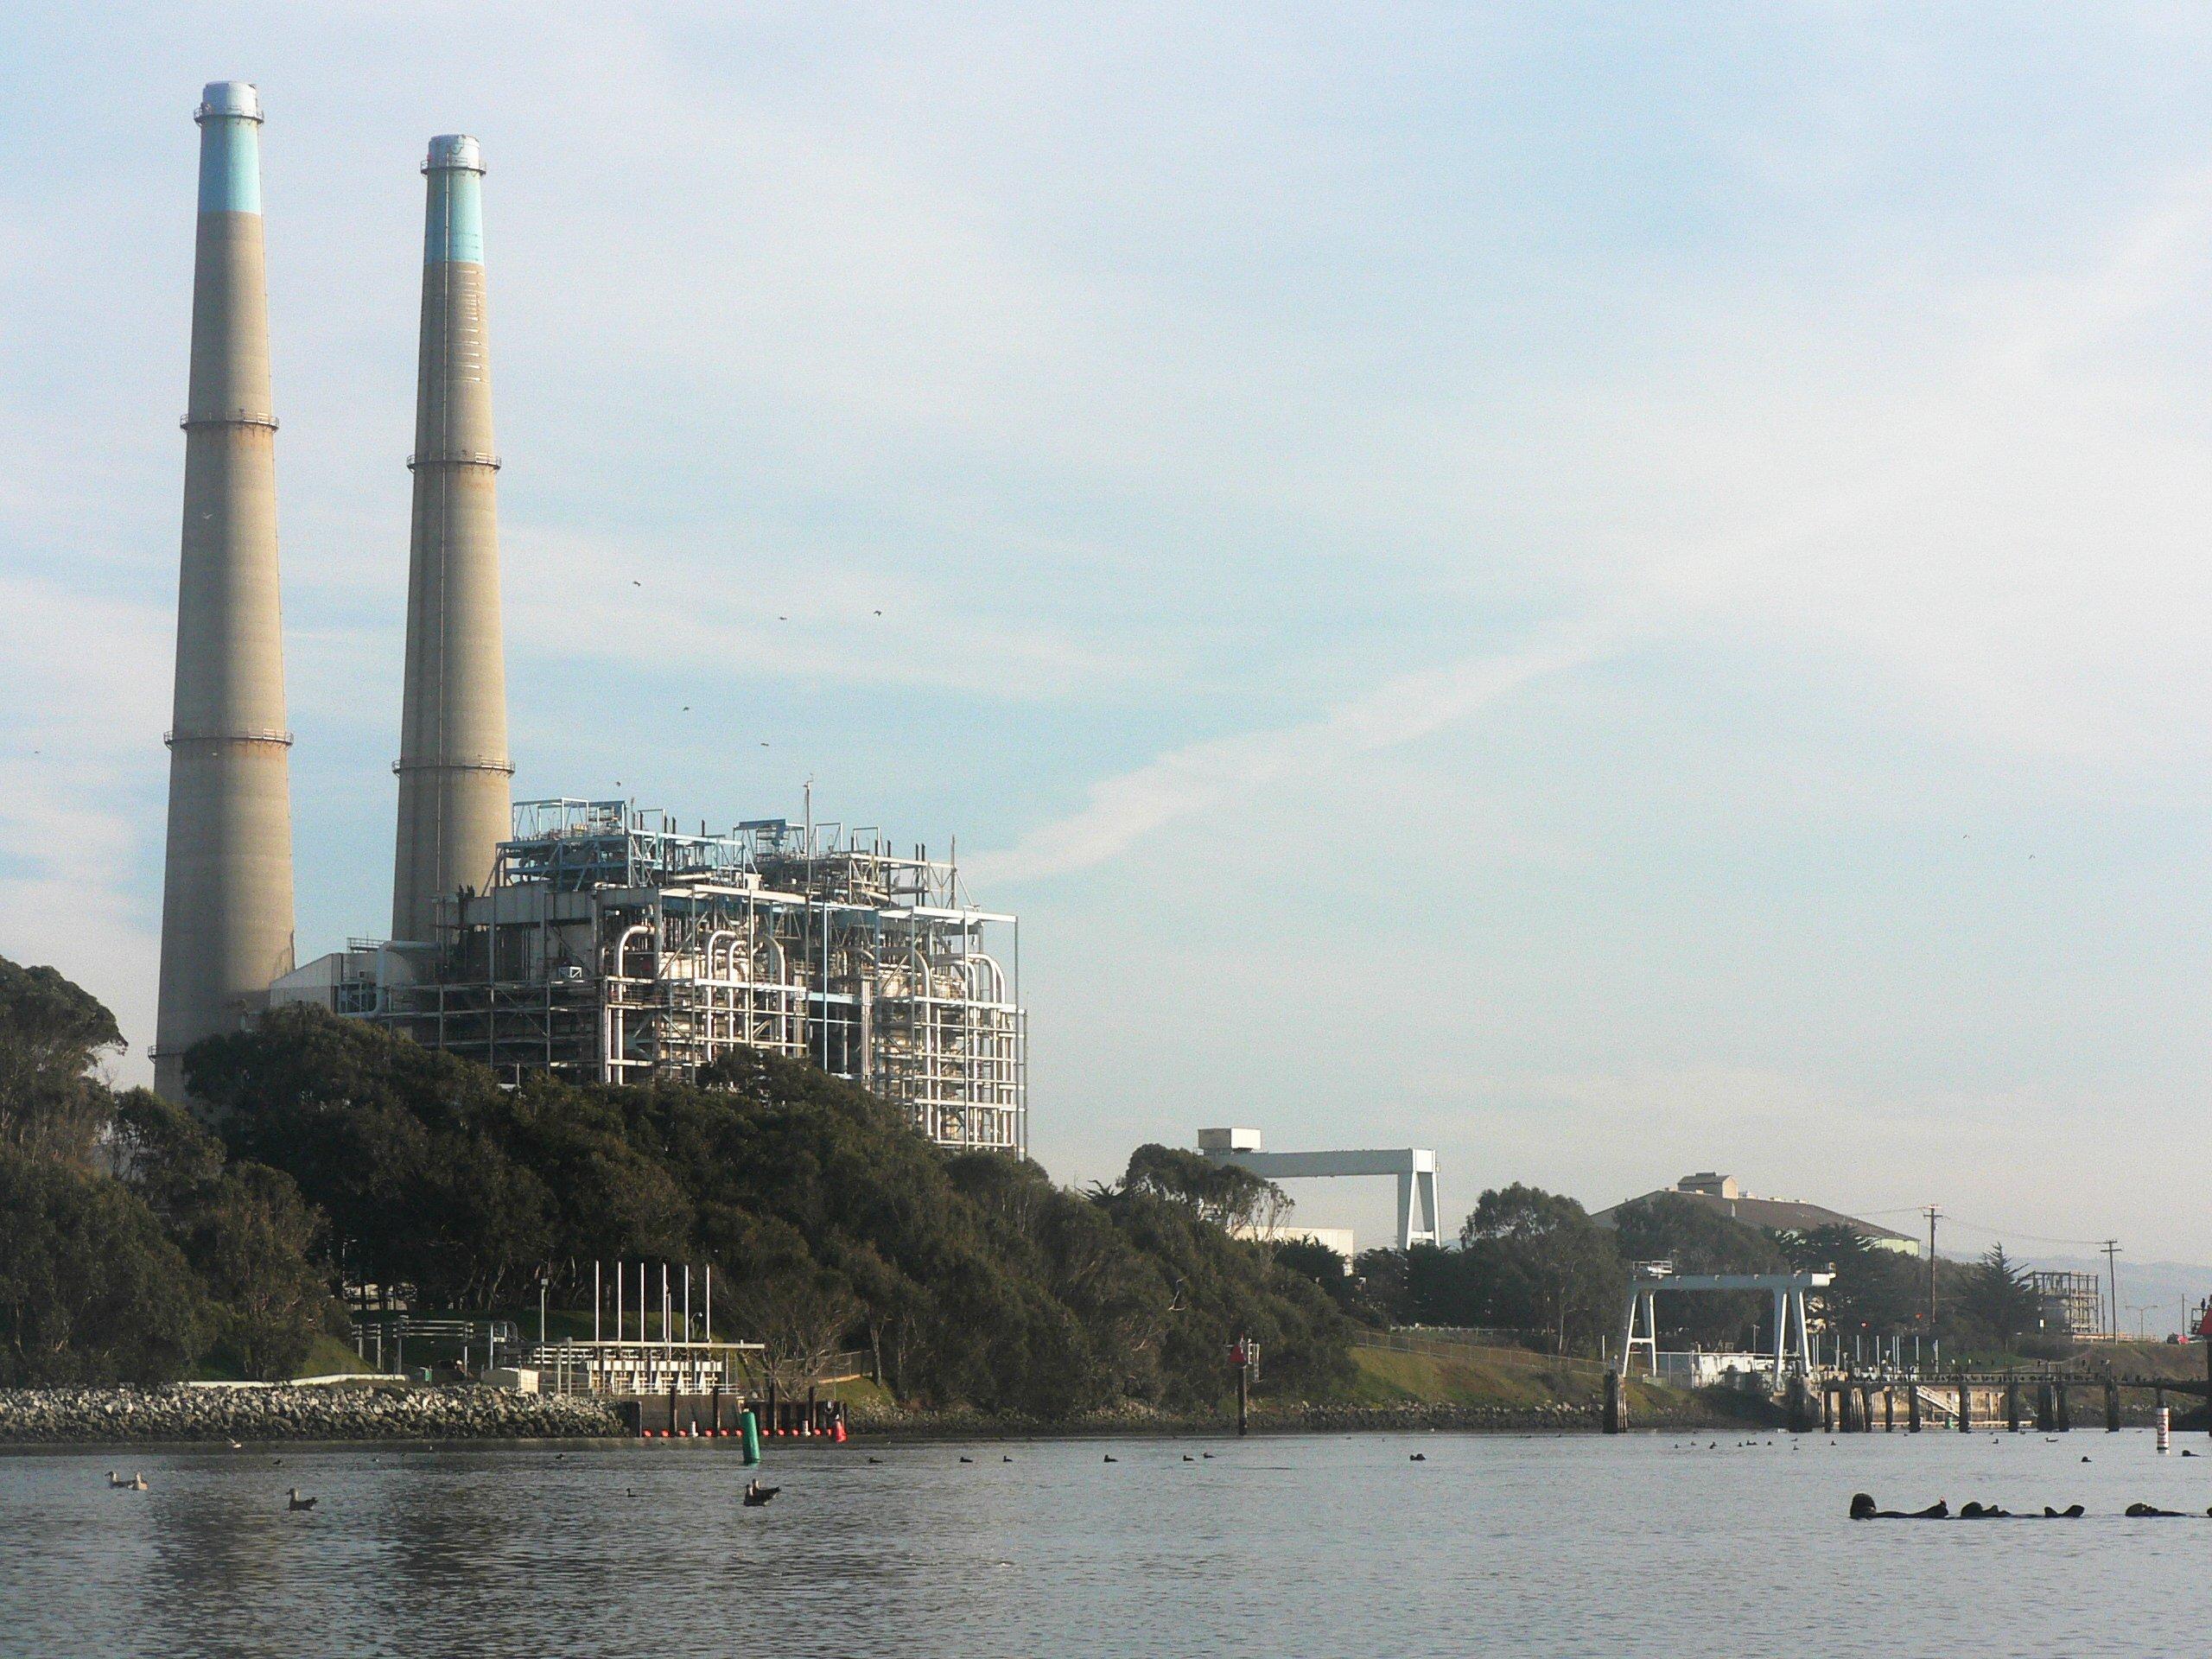 Image 2-Moss Landing Power Plant